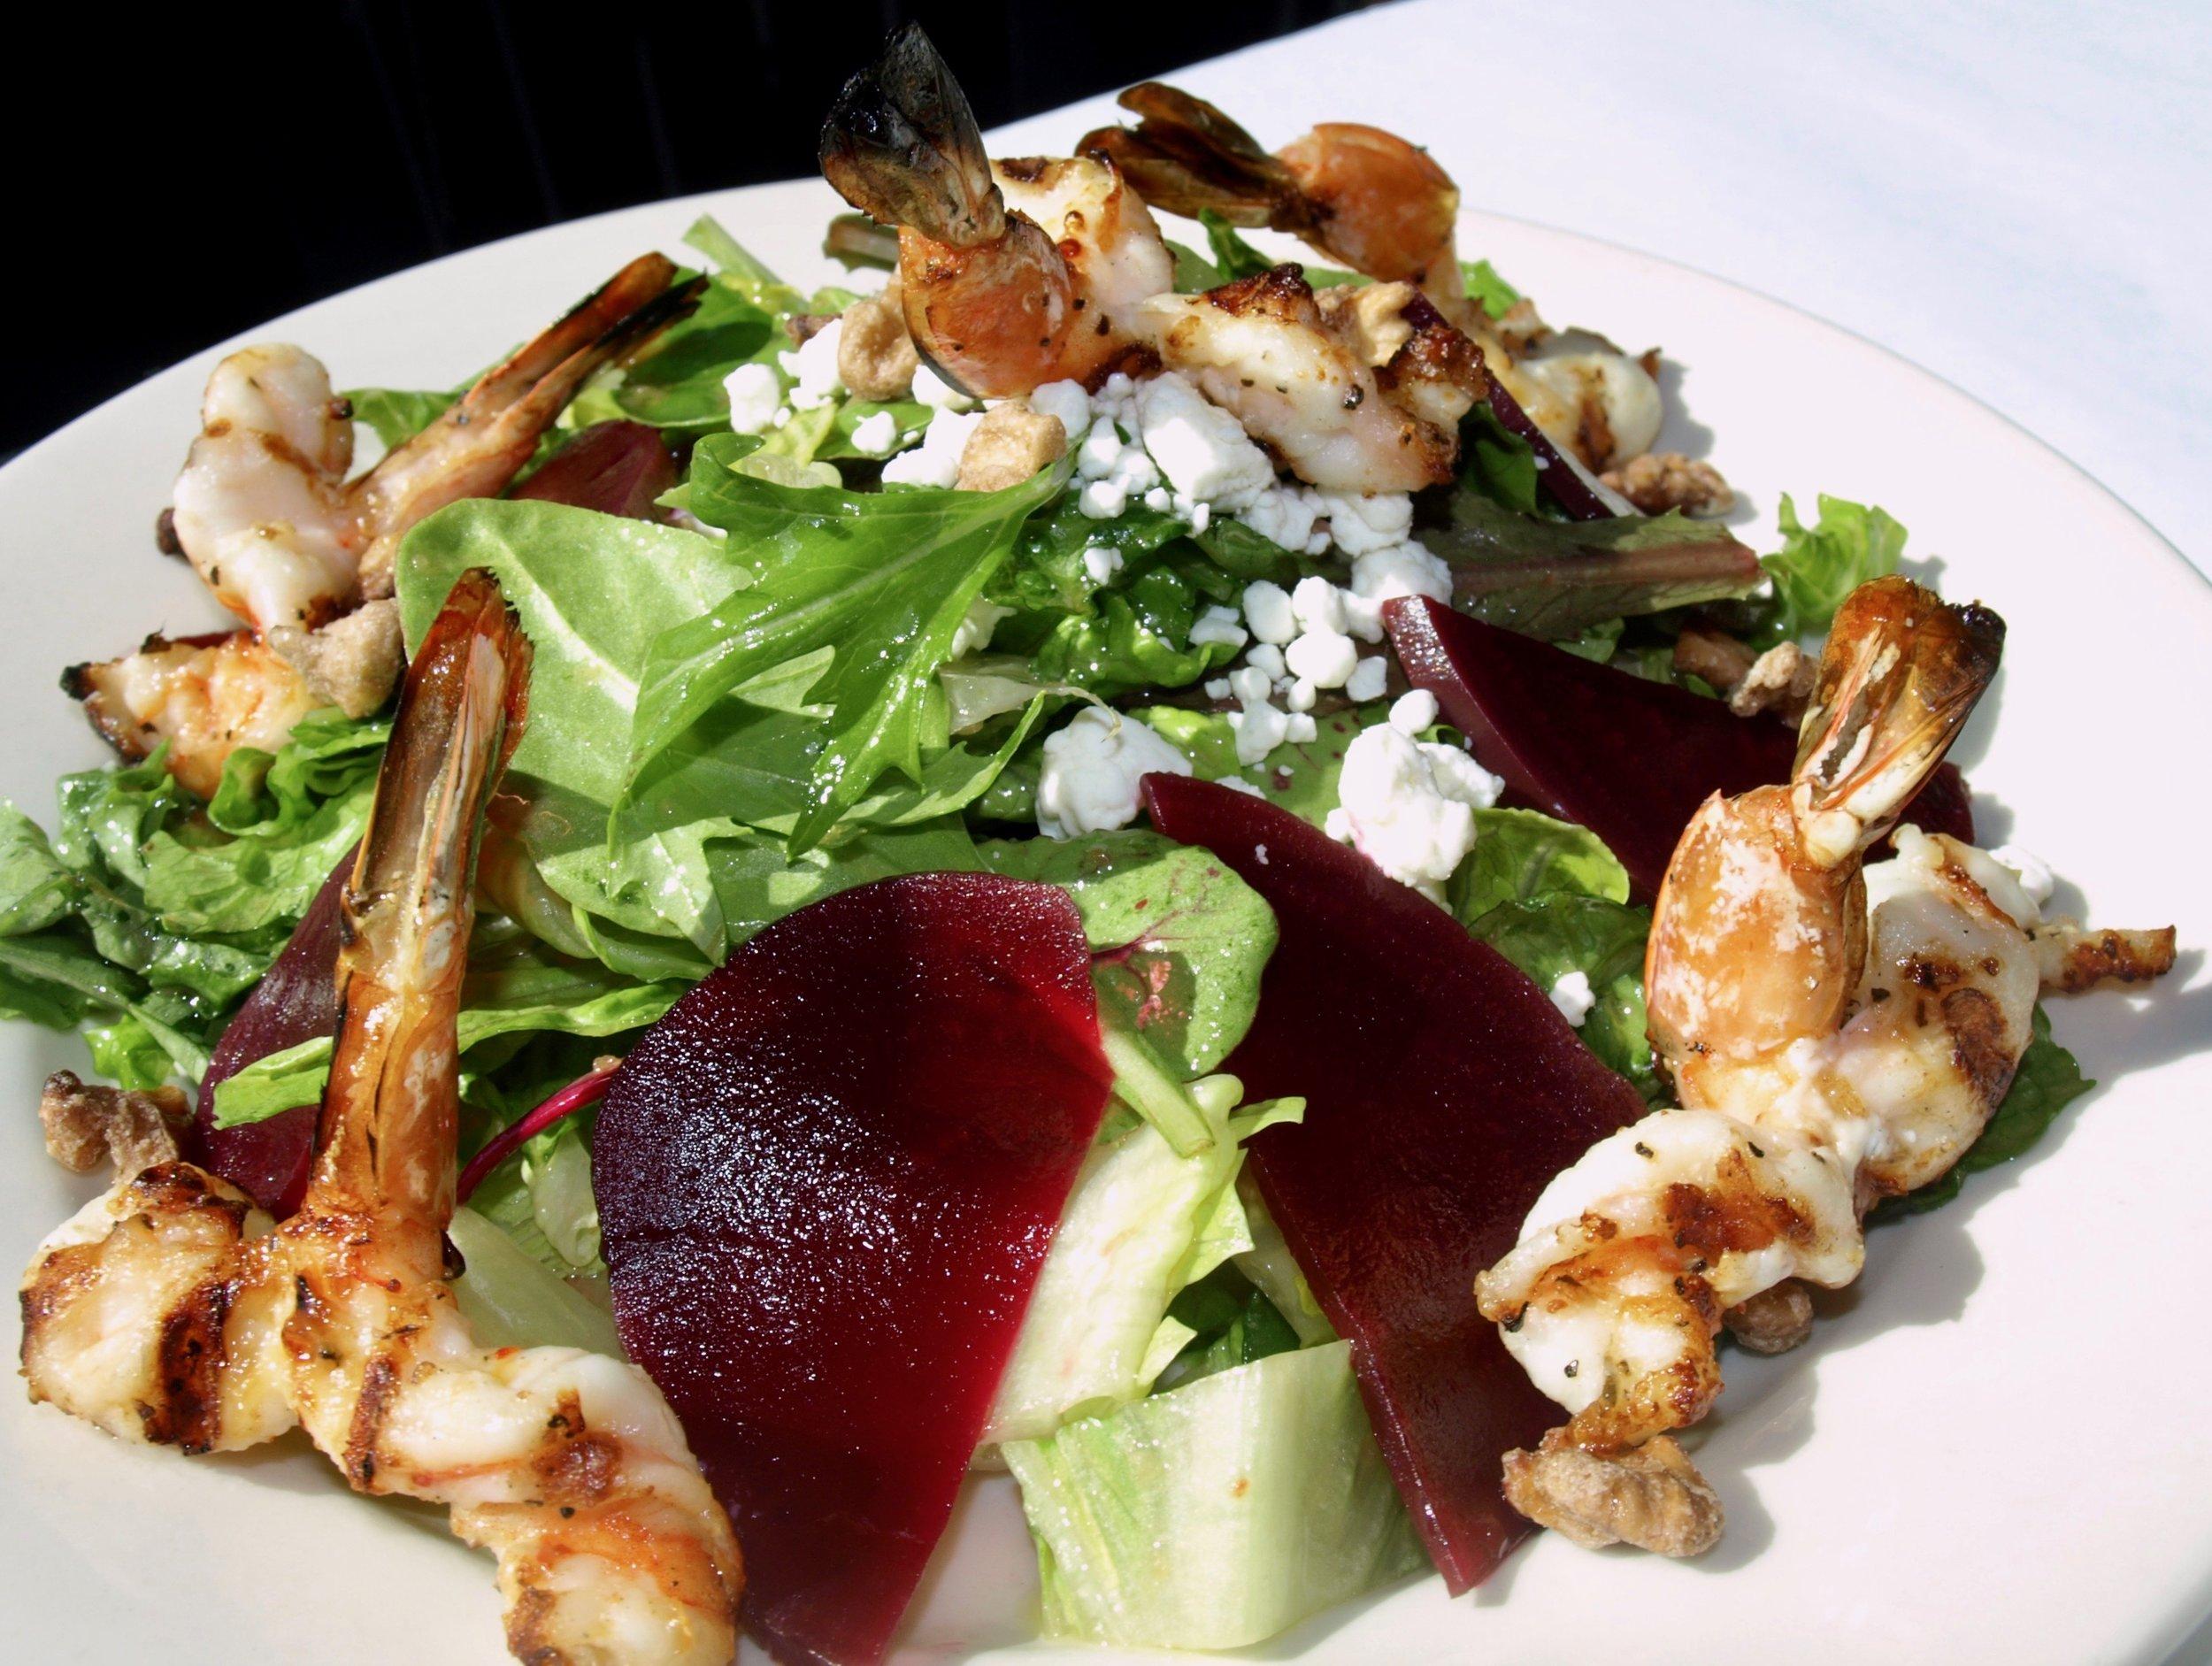 Beet salad of mixed greens, goat cheese, walnuts and balsamic dressing